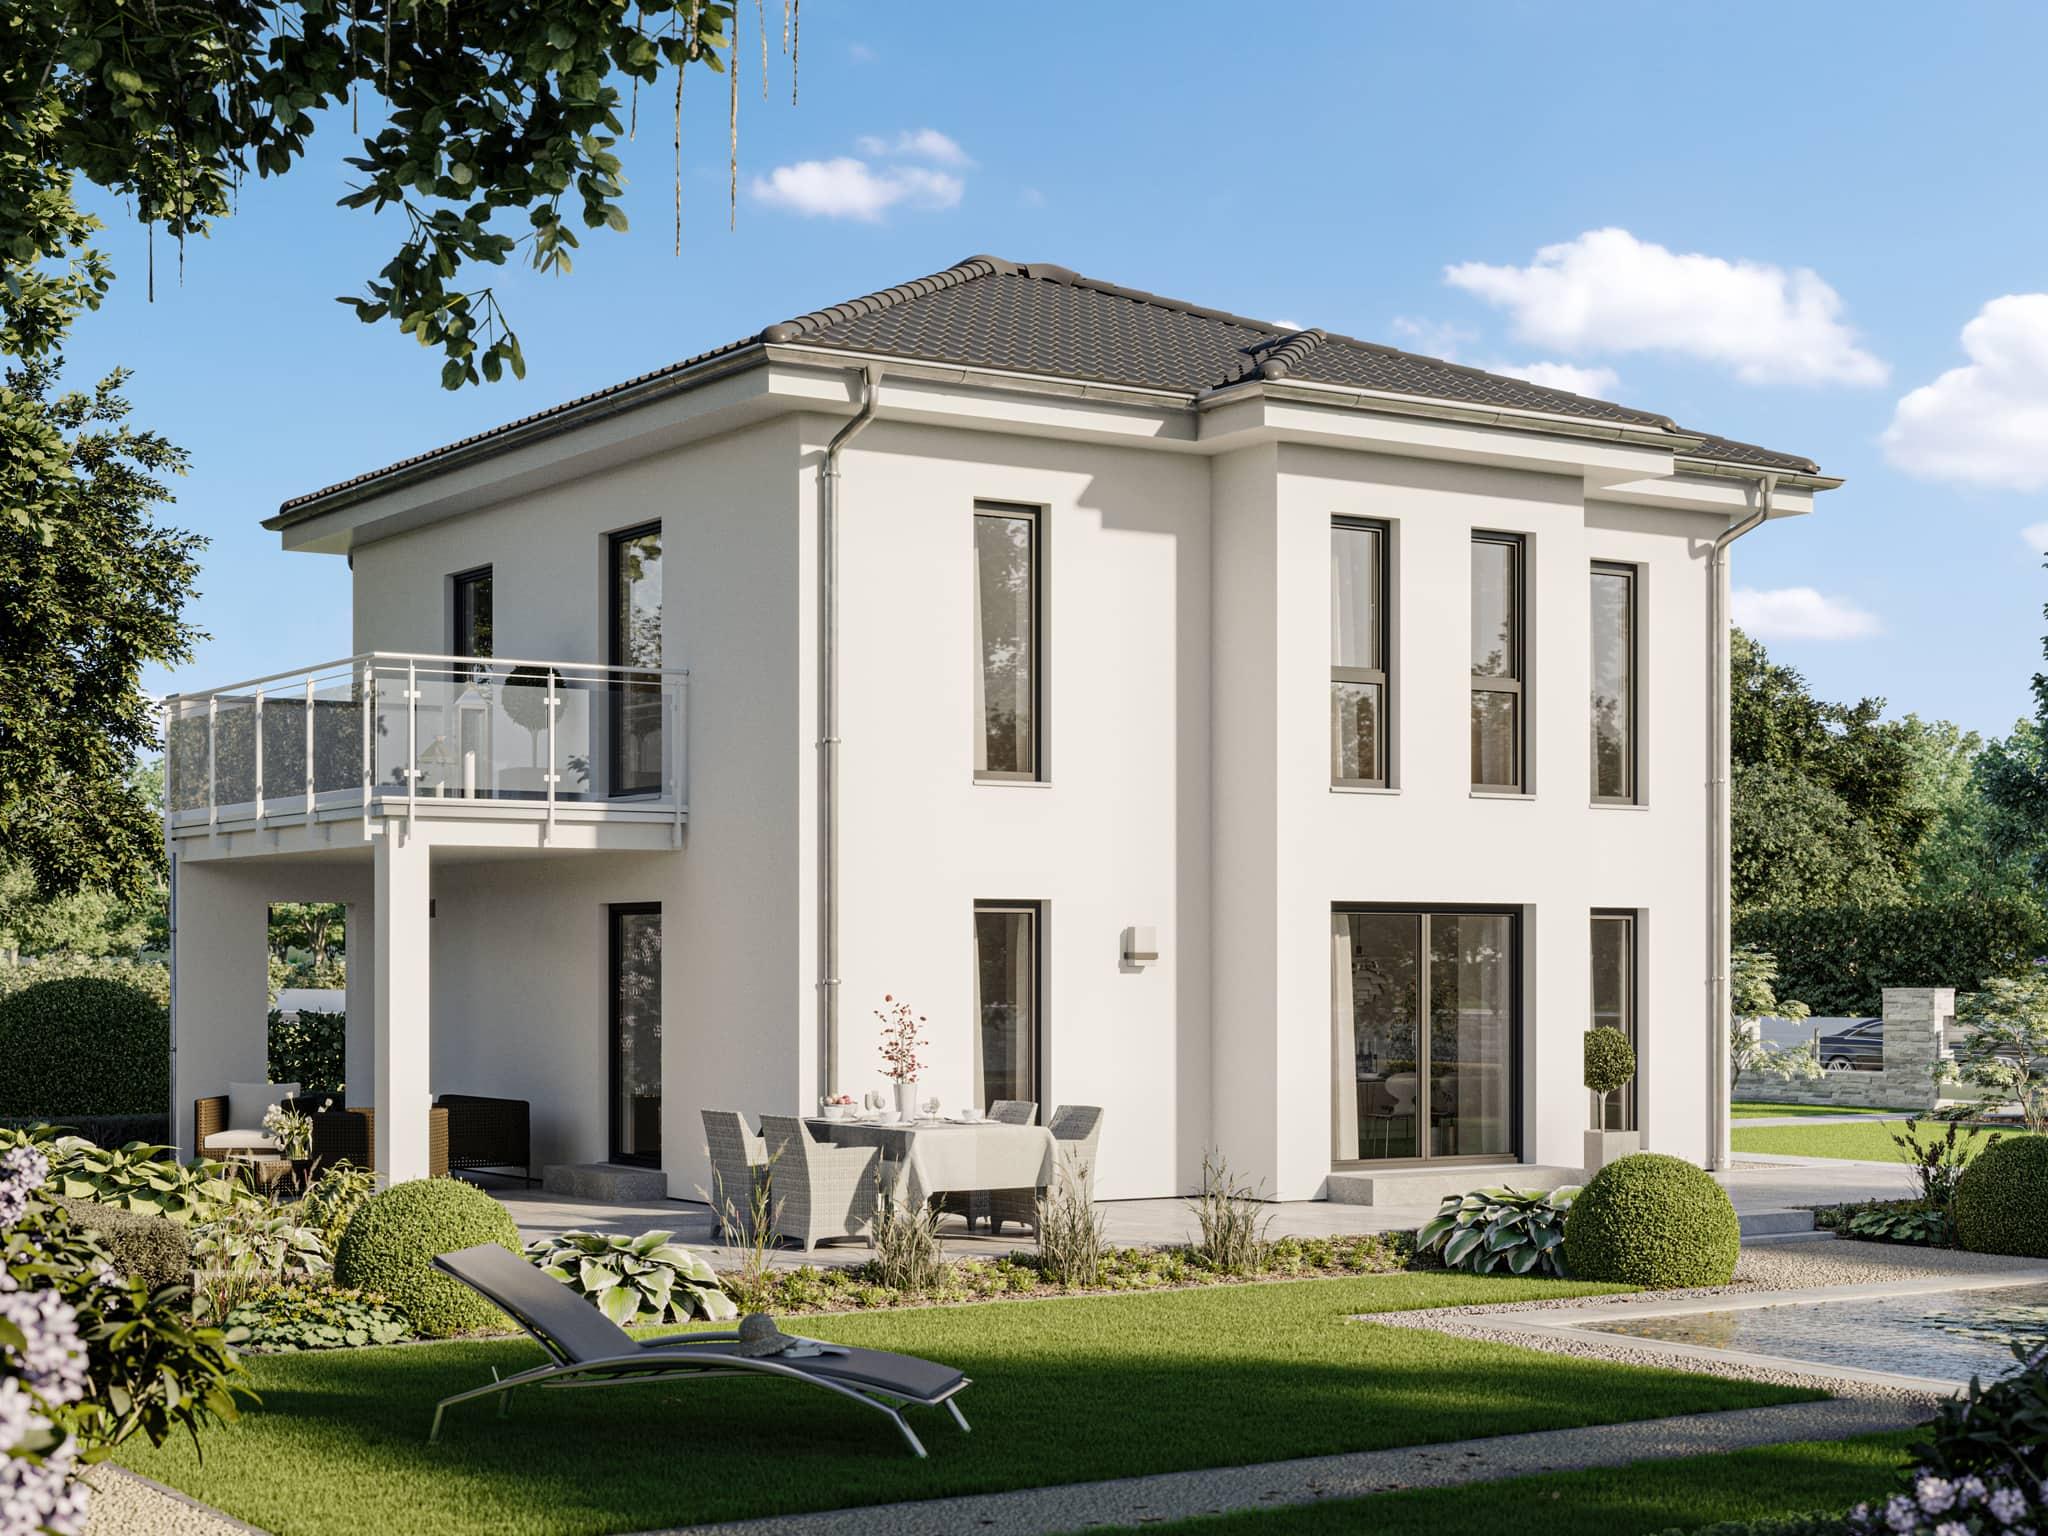 Neubau Stadtvilla mit Walmdach, Erker & Balkon, 5 Zimmer, 130 qm - Haus bauen Ideen Bien Zenker Fertighaus EDITION 134 V5 - HausbauDirekt.de